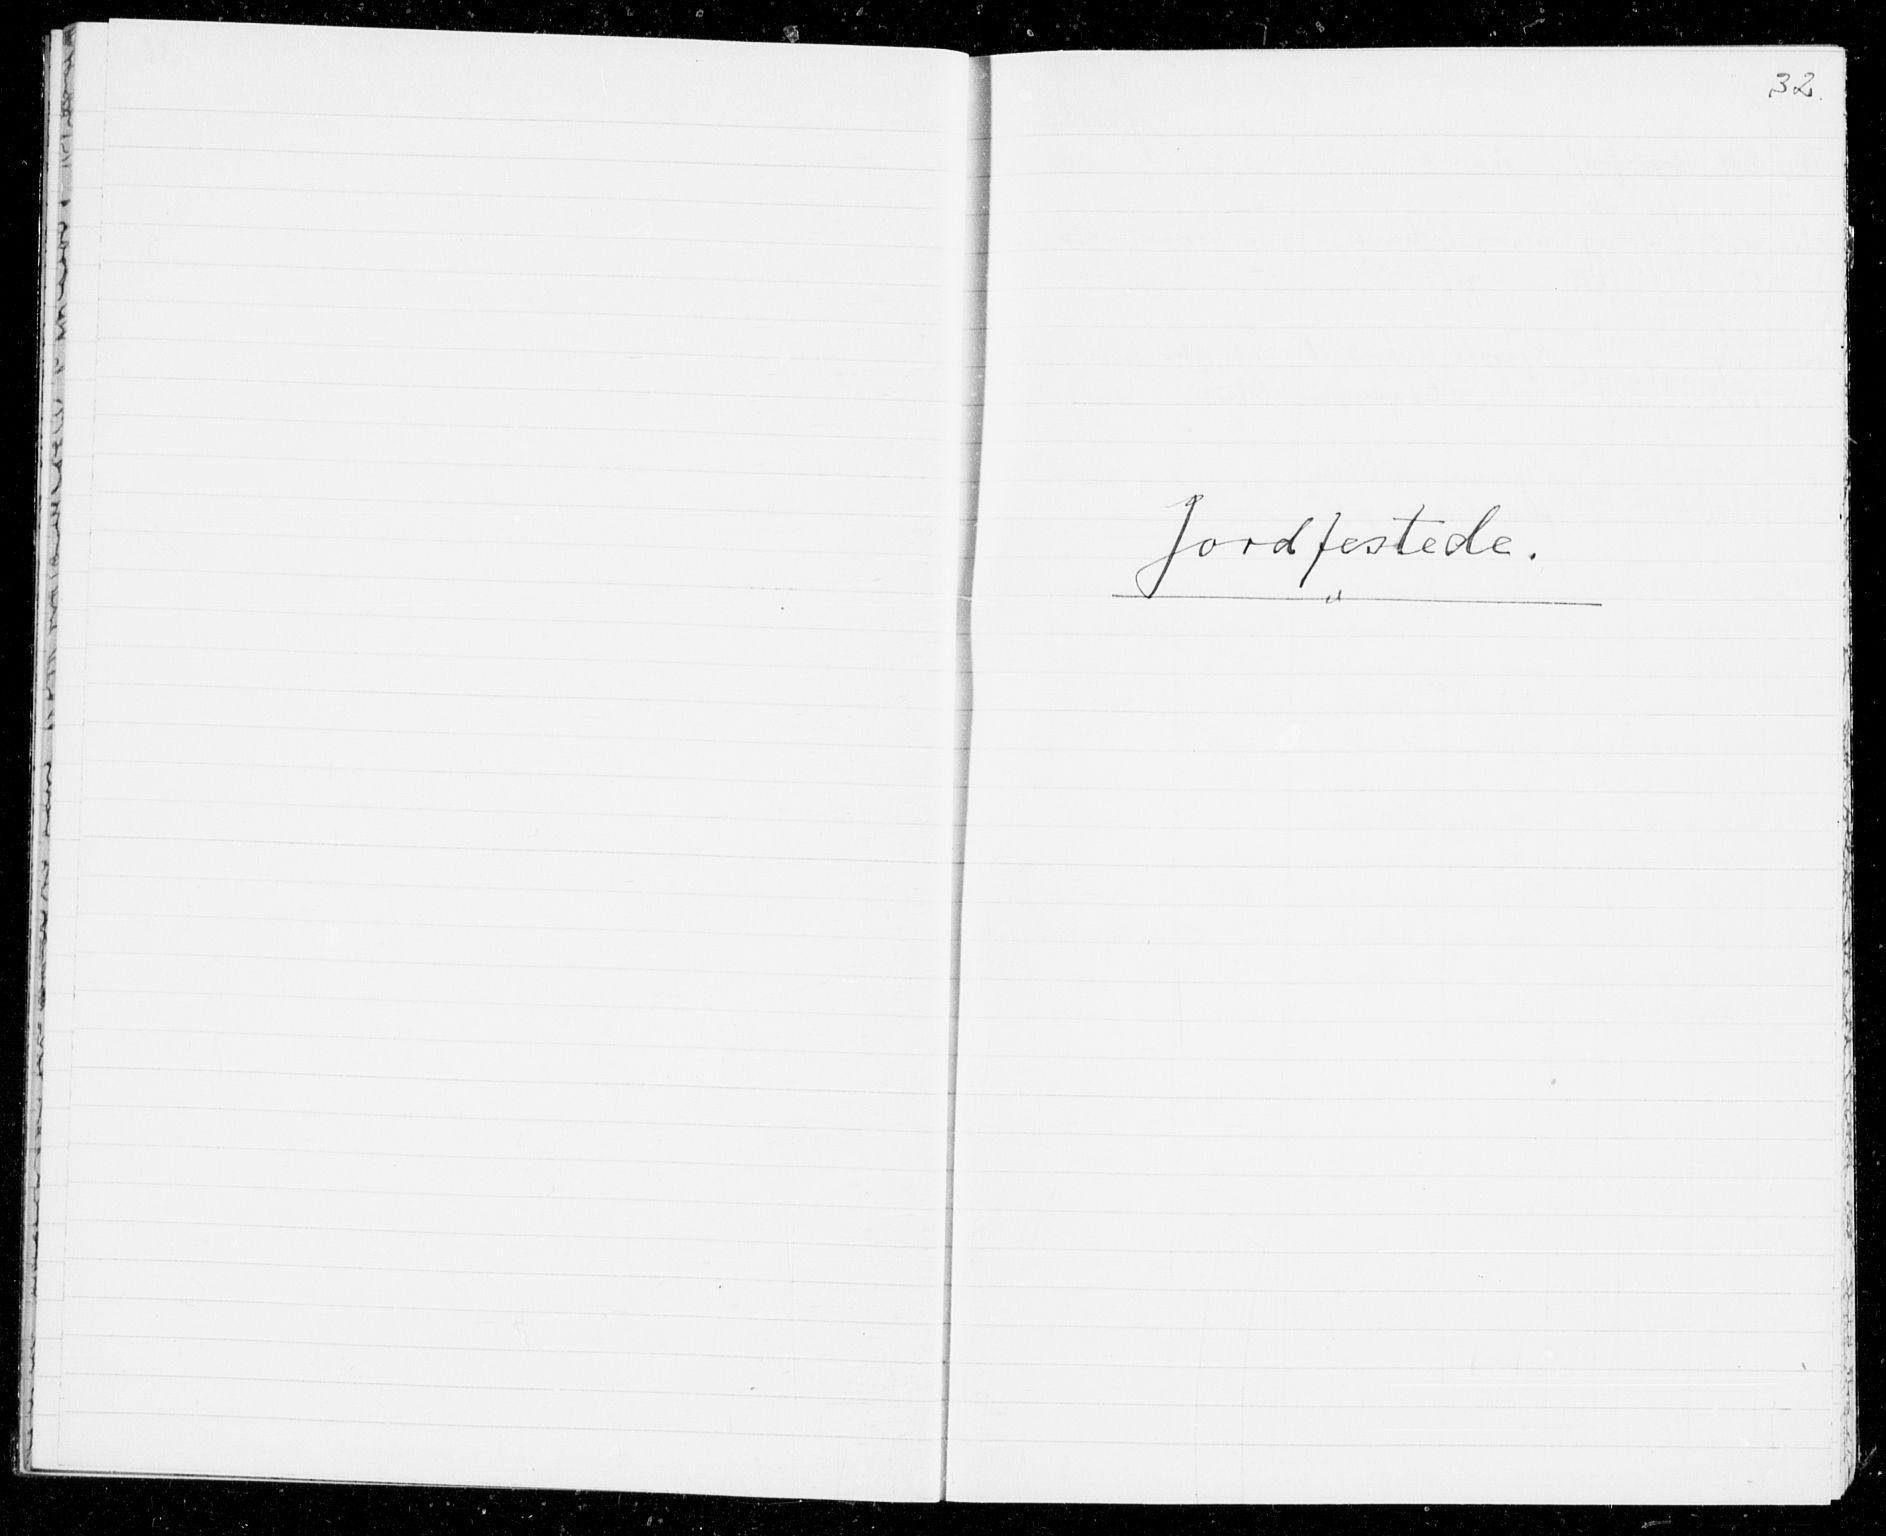 SAKO, Holla kirkebøker, G/Gb/L0004: Klokkerbok nr. II 4, 1942-1943, s. 32